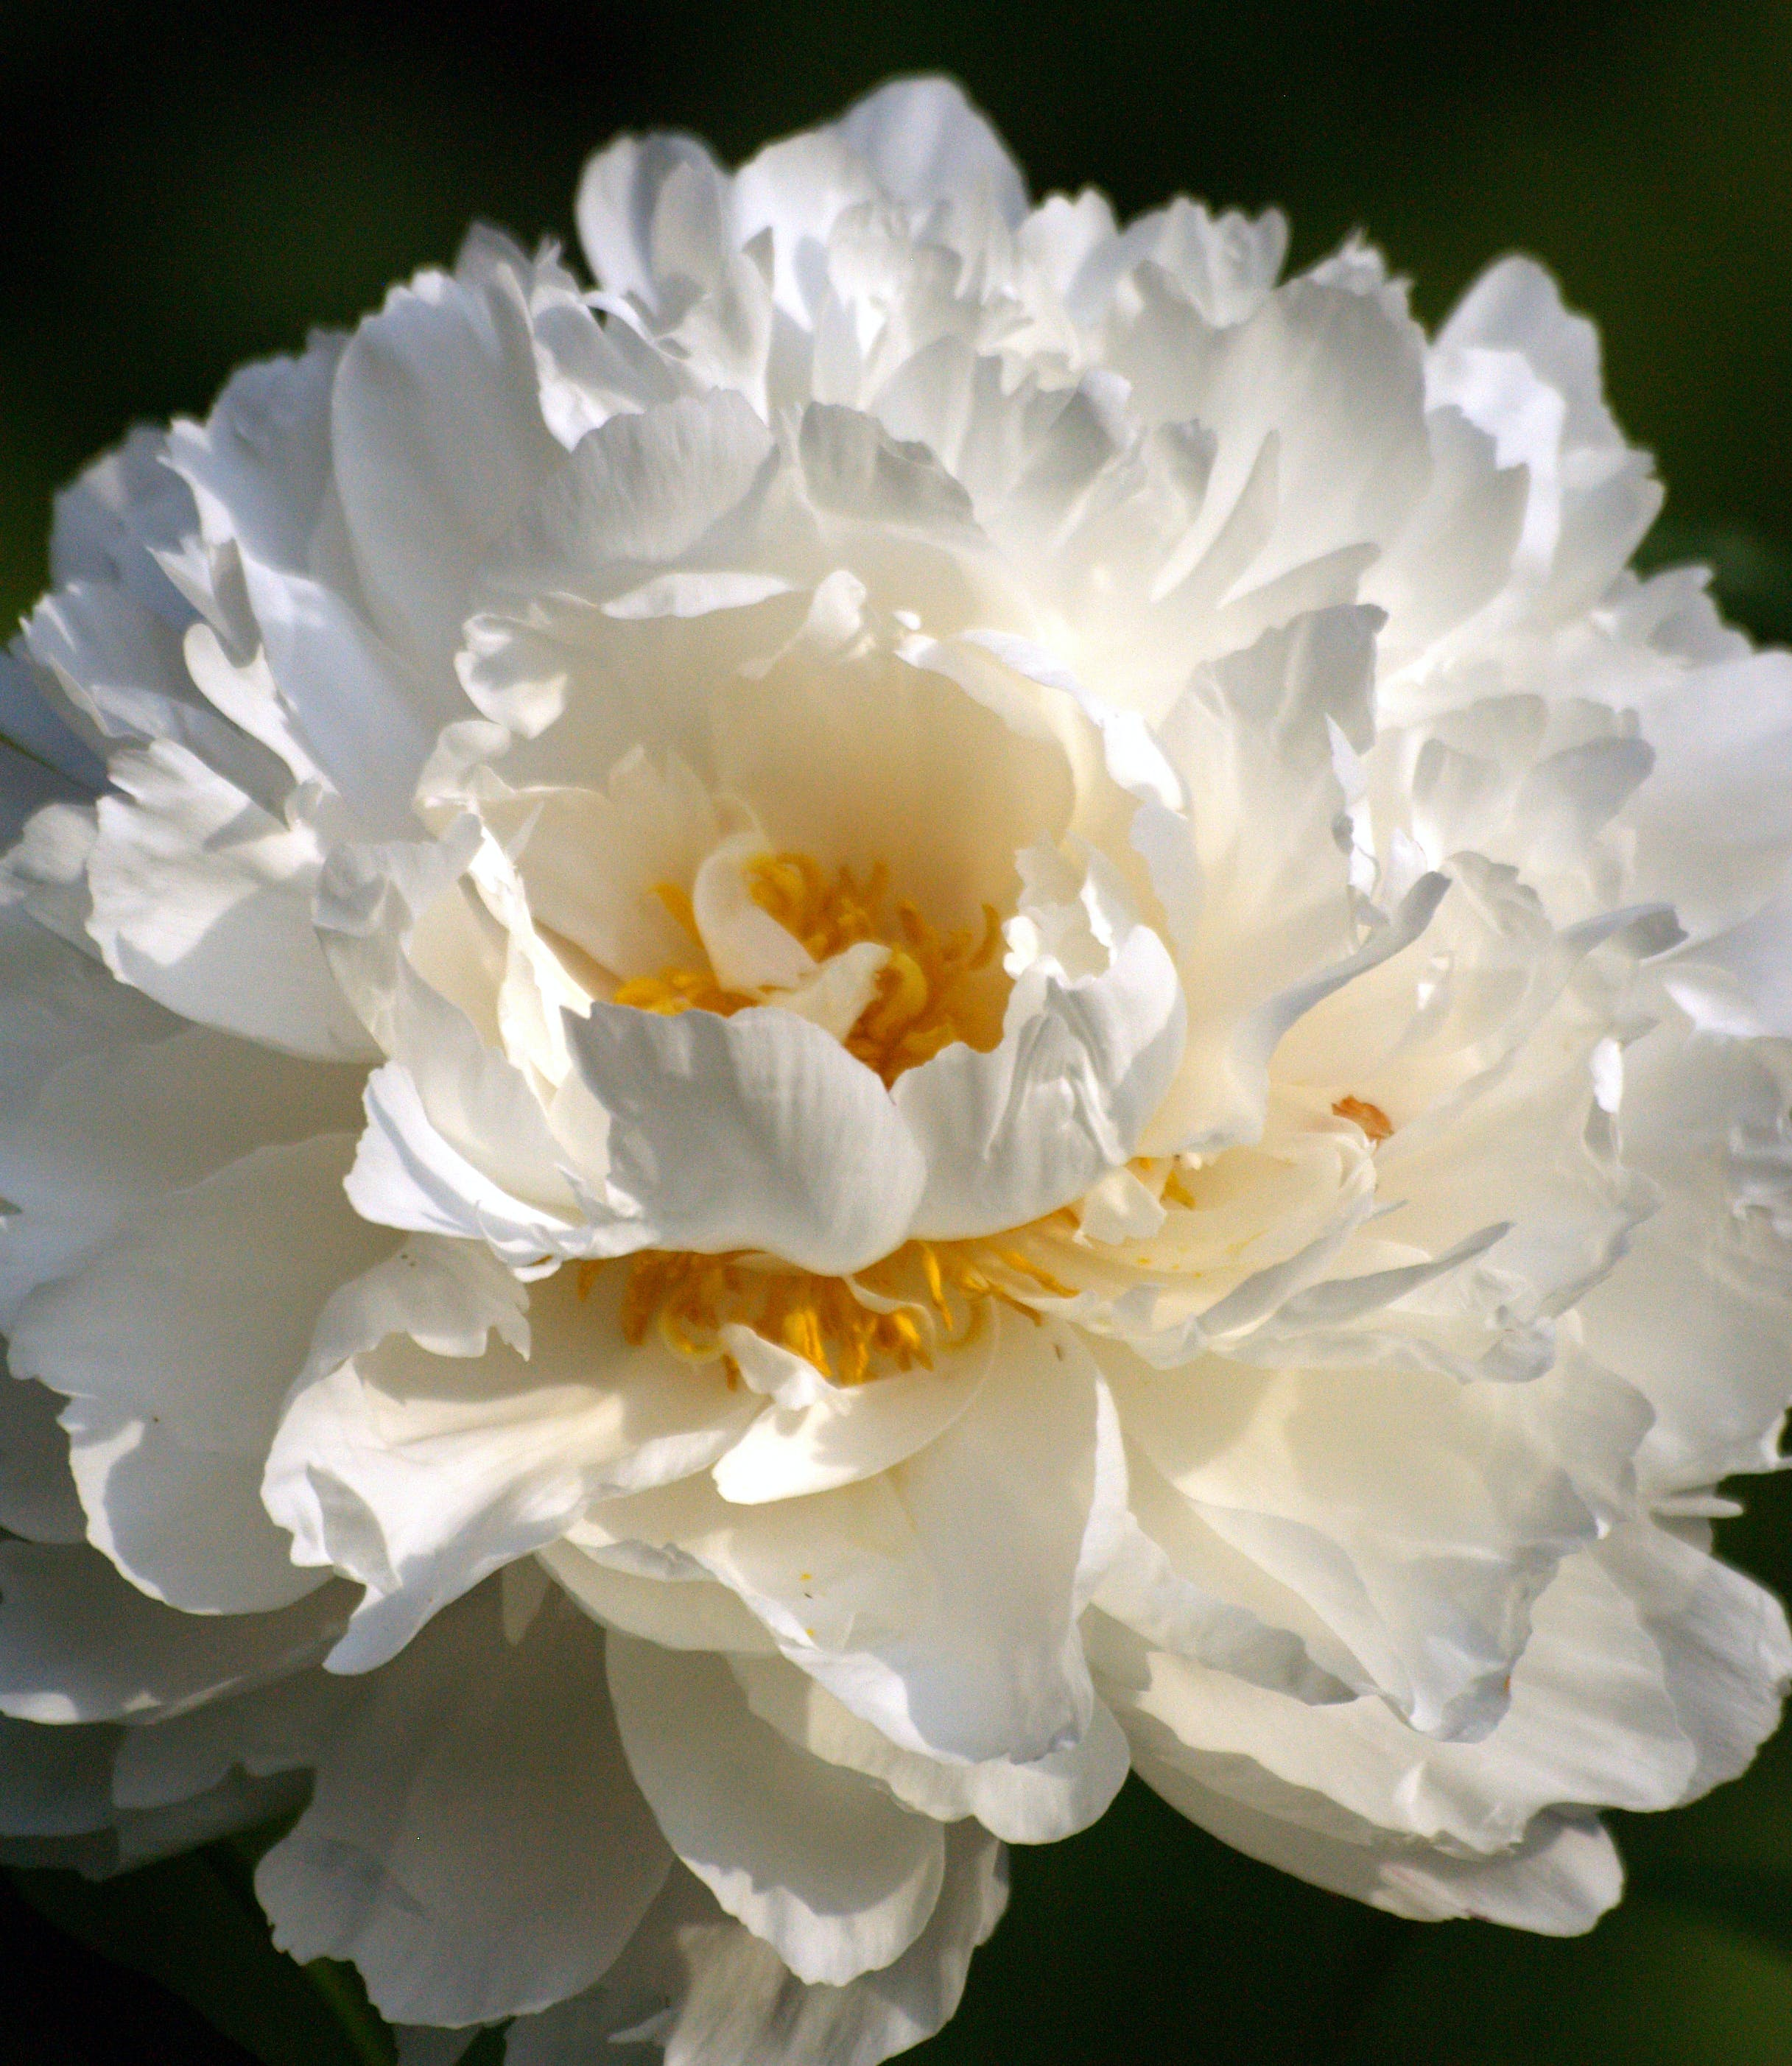 Free stock photo of flower, peony, white flower